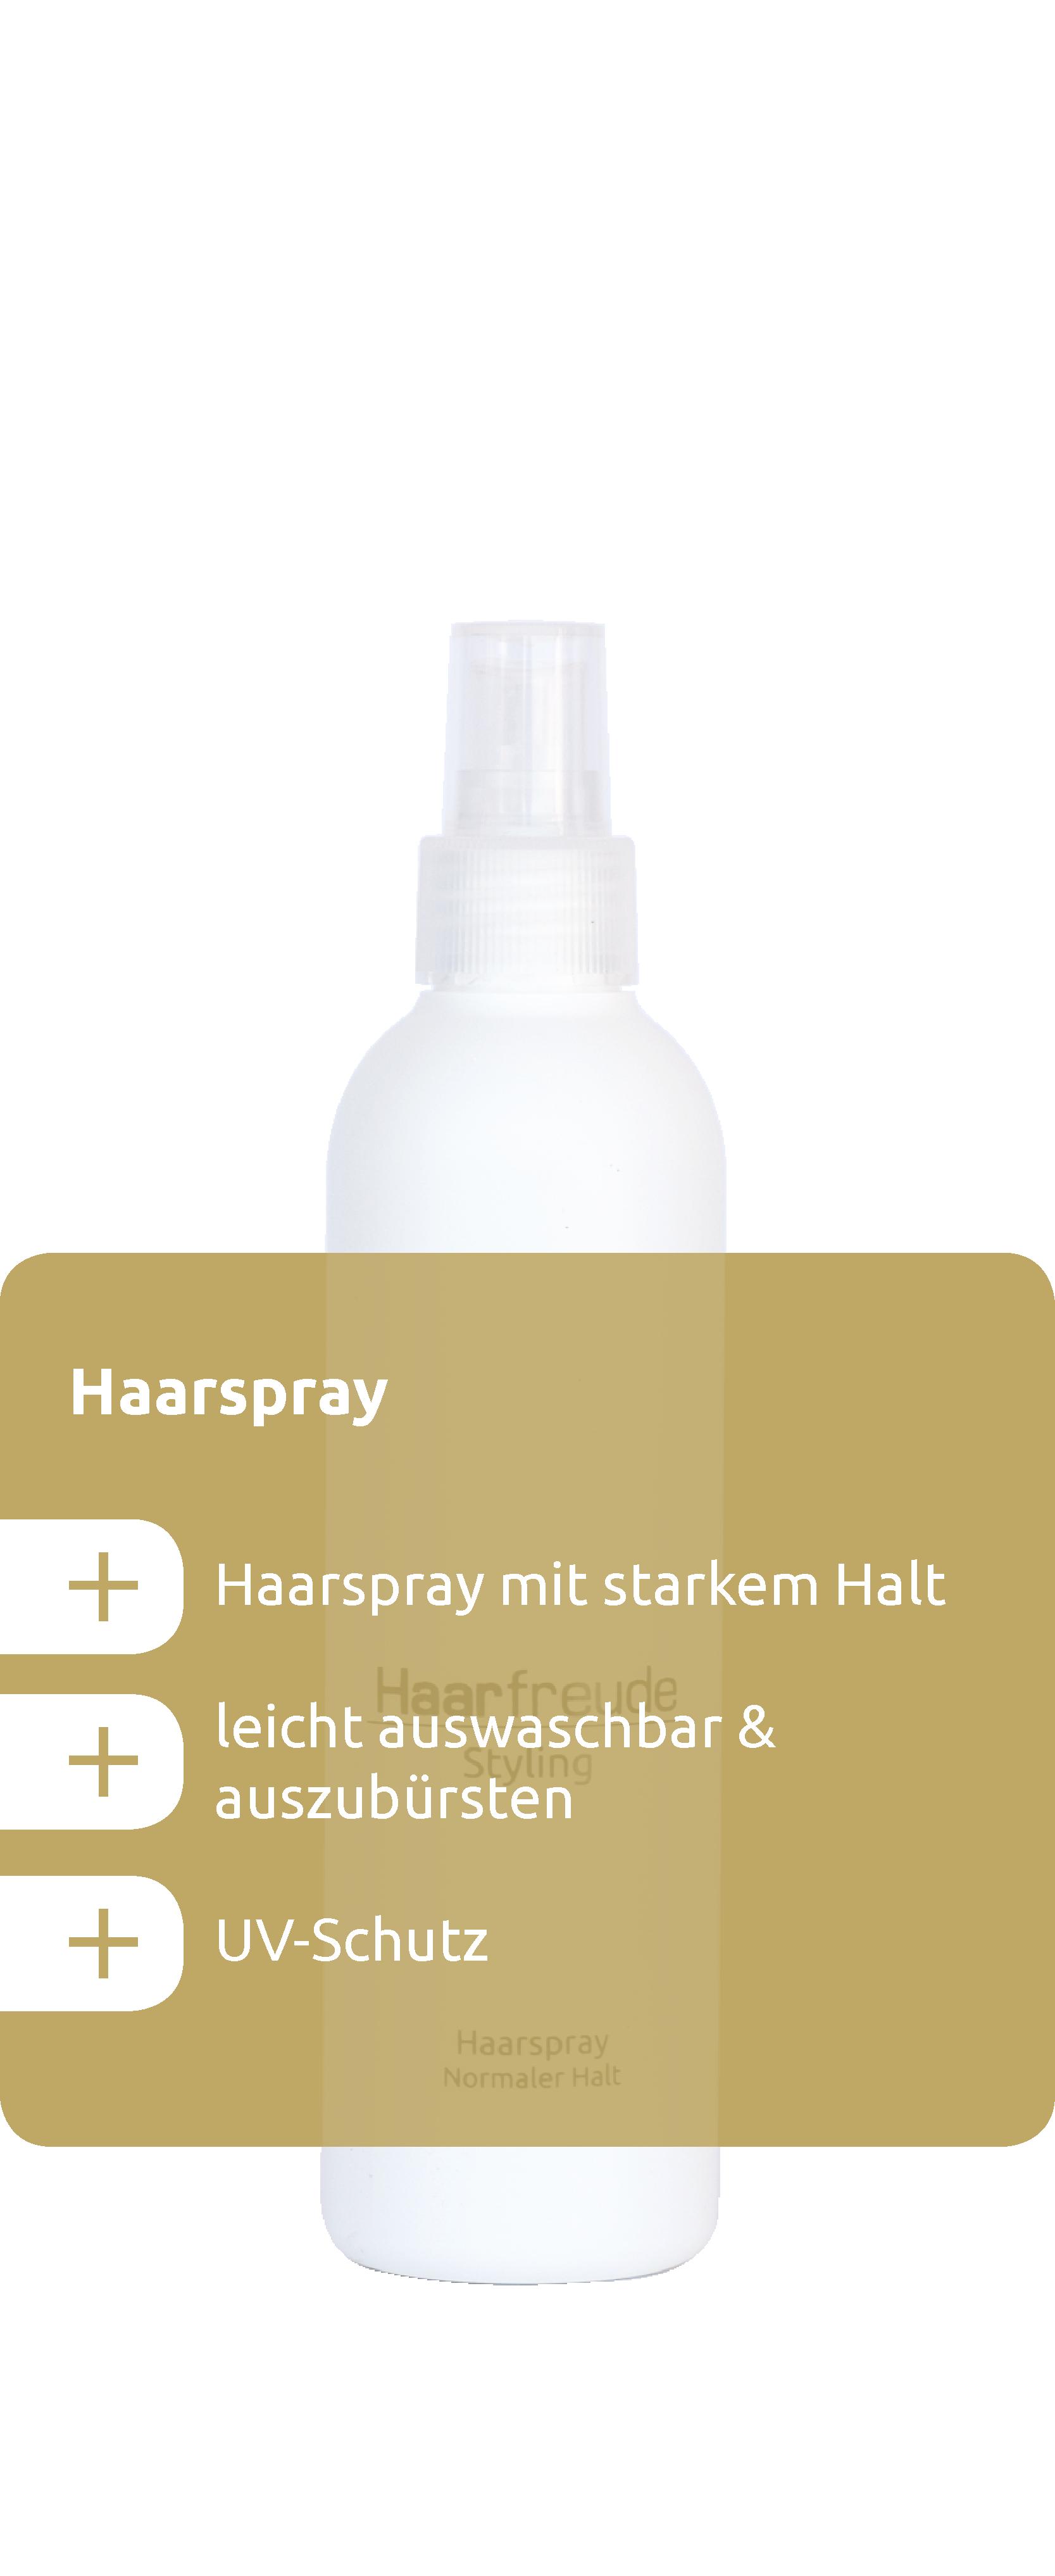 haarspray_hover3